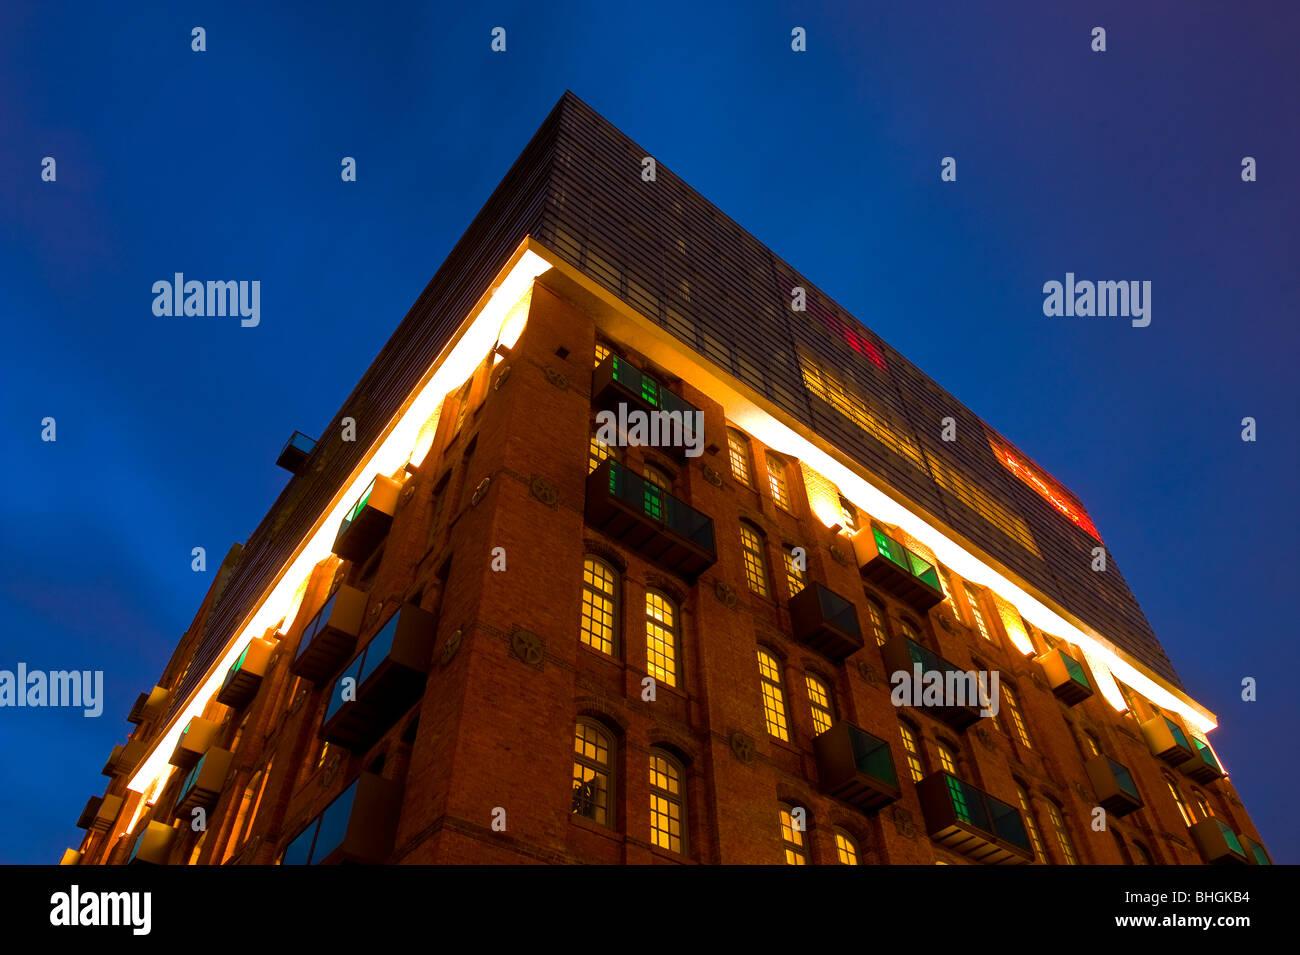 Hamburger Speicherstadtdetail bei Nacht - Stock Image